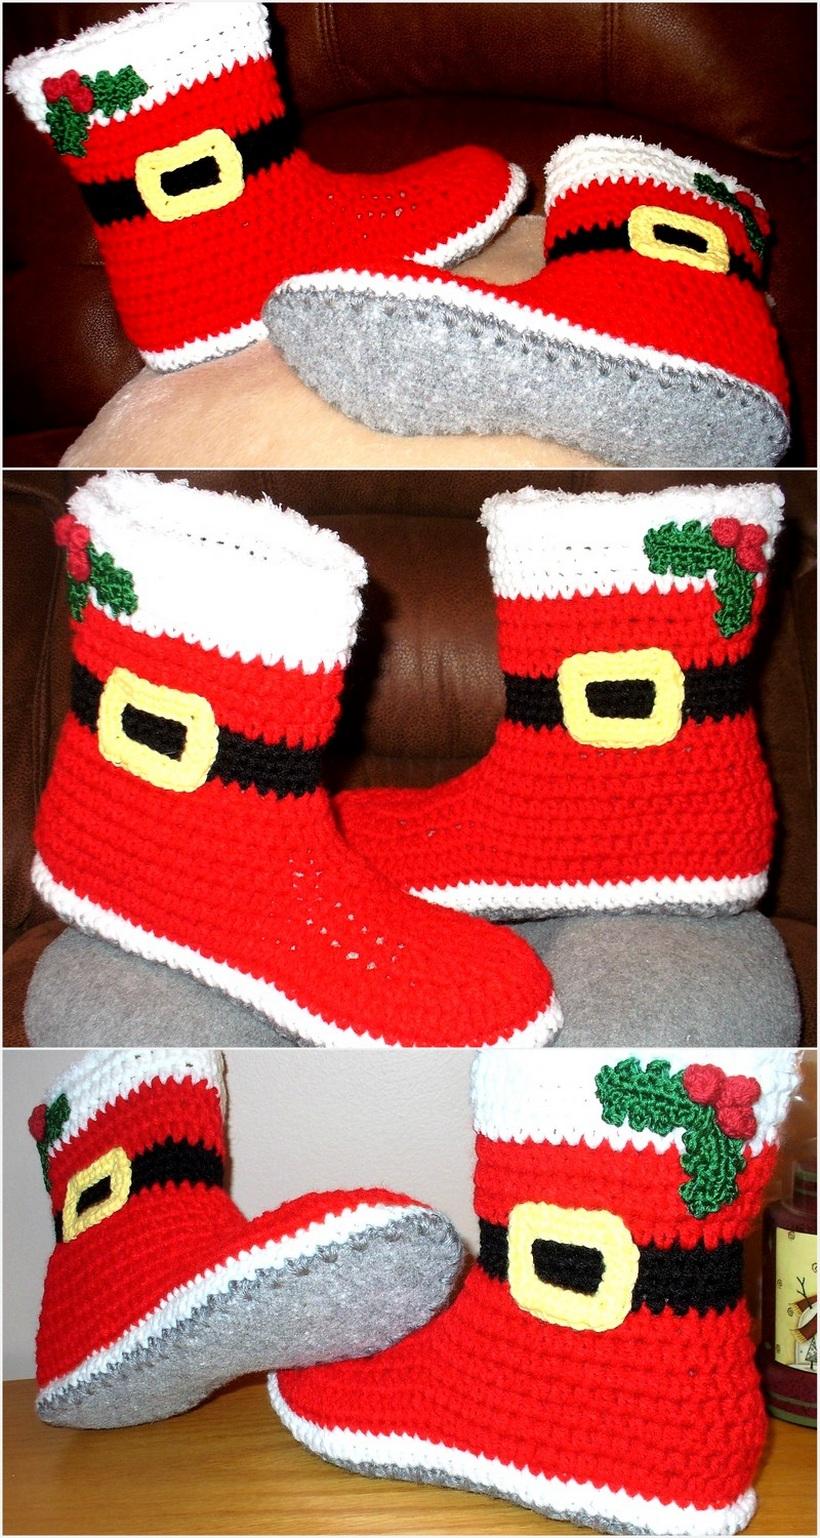 crocheted-baby-booties-9